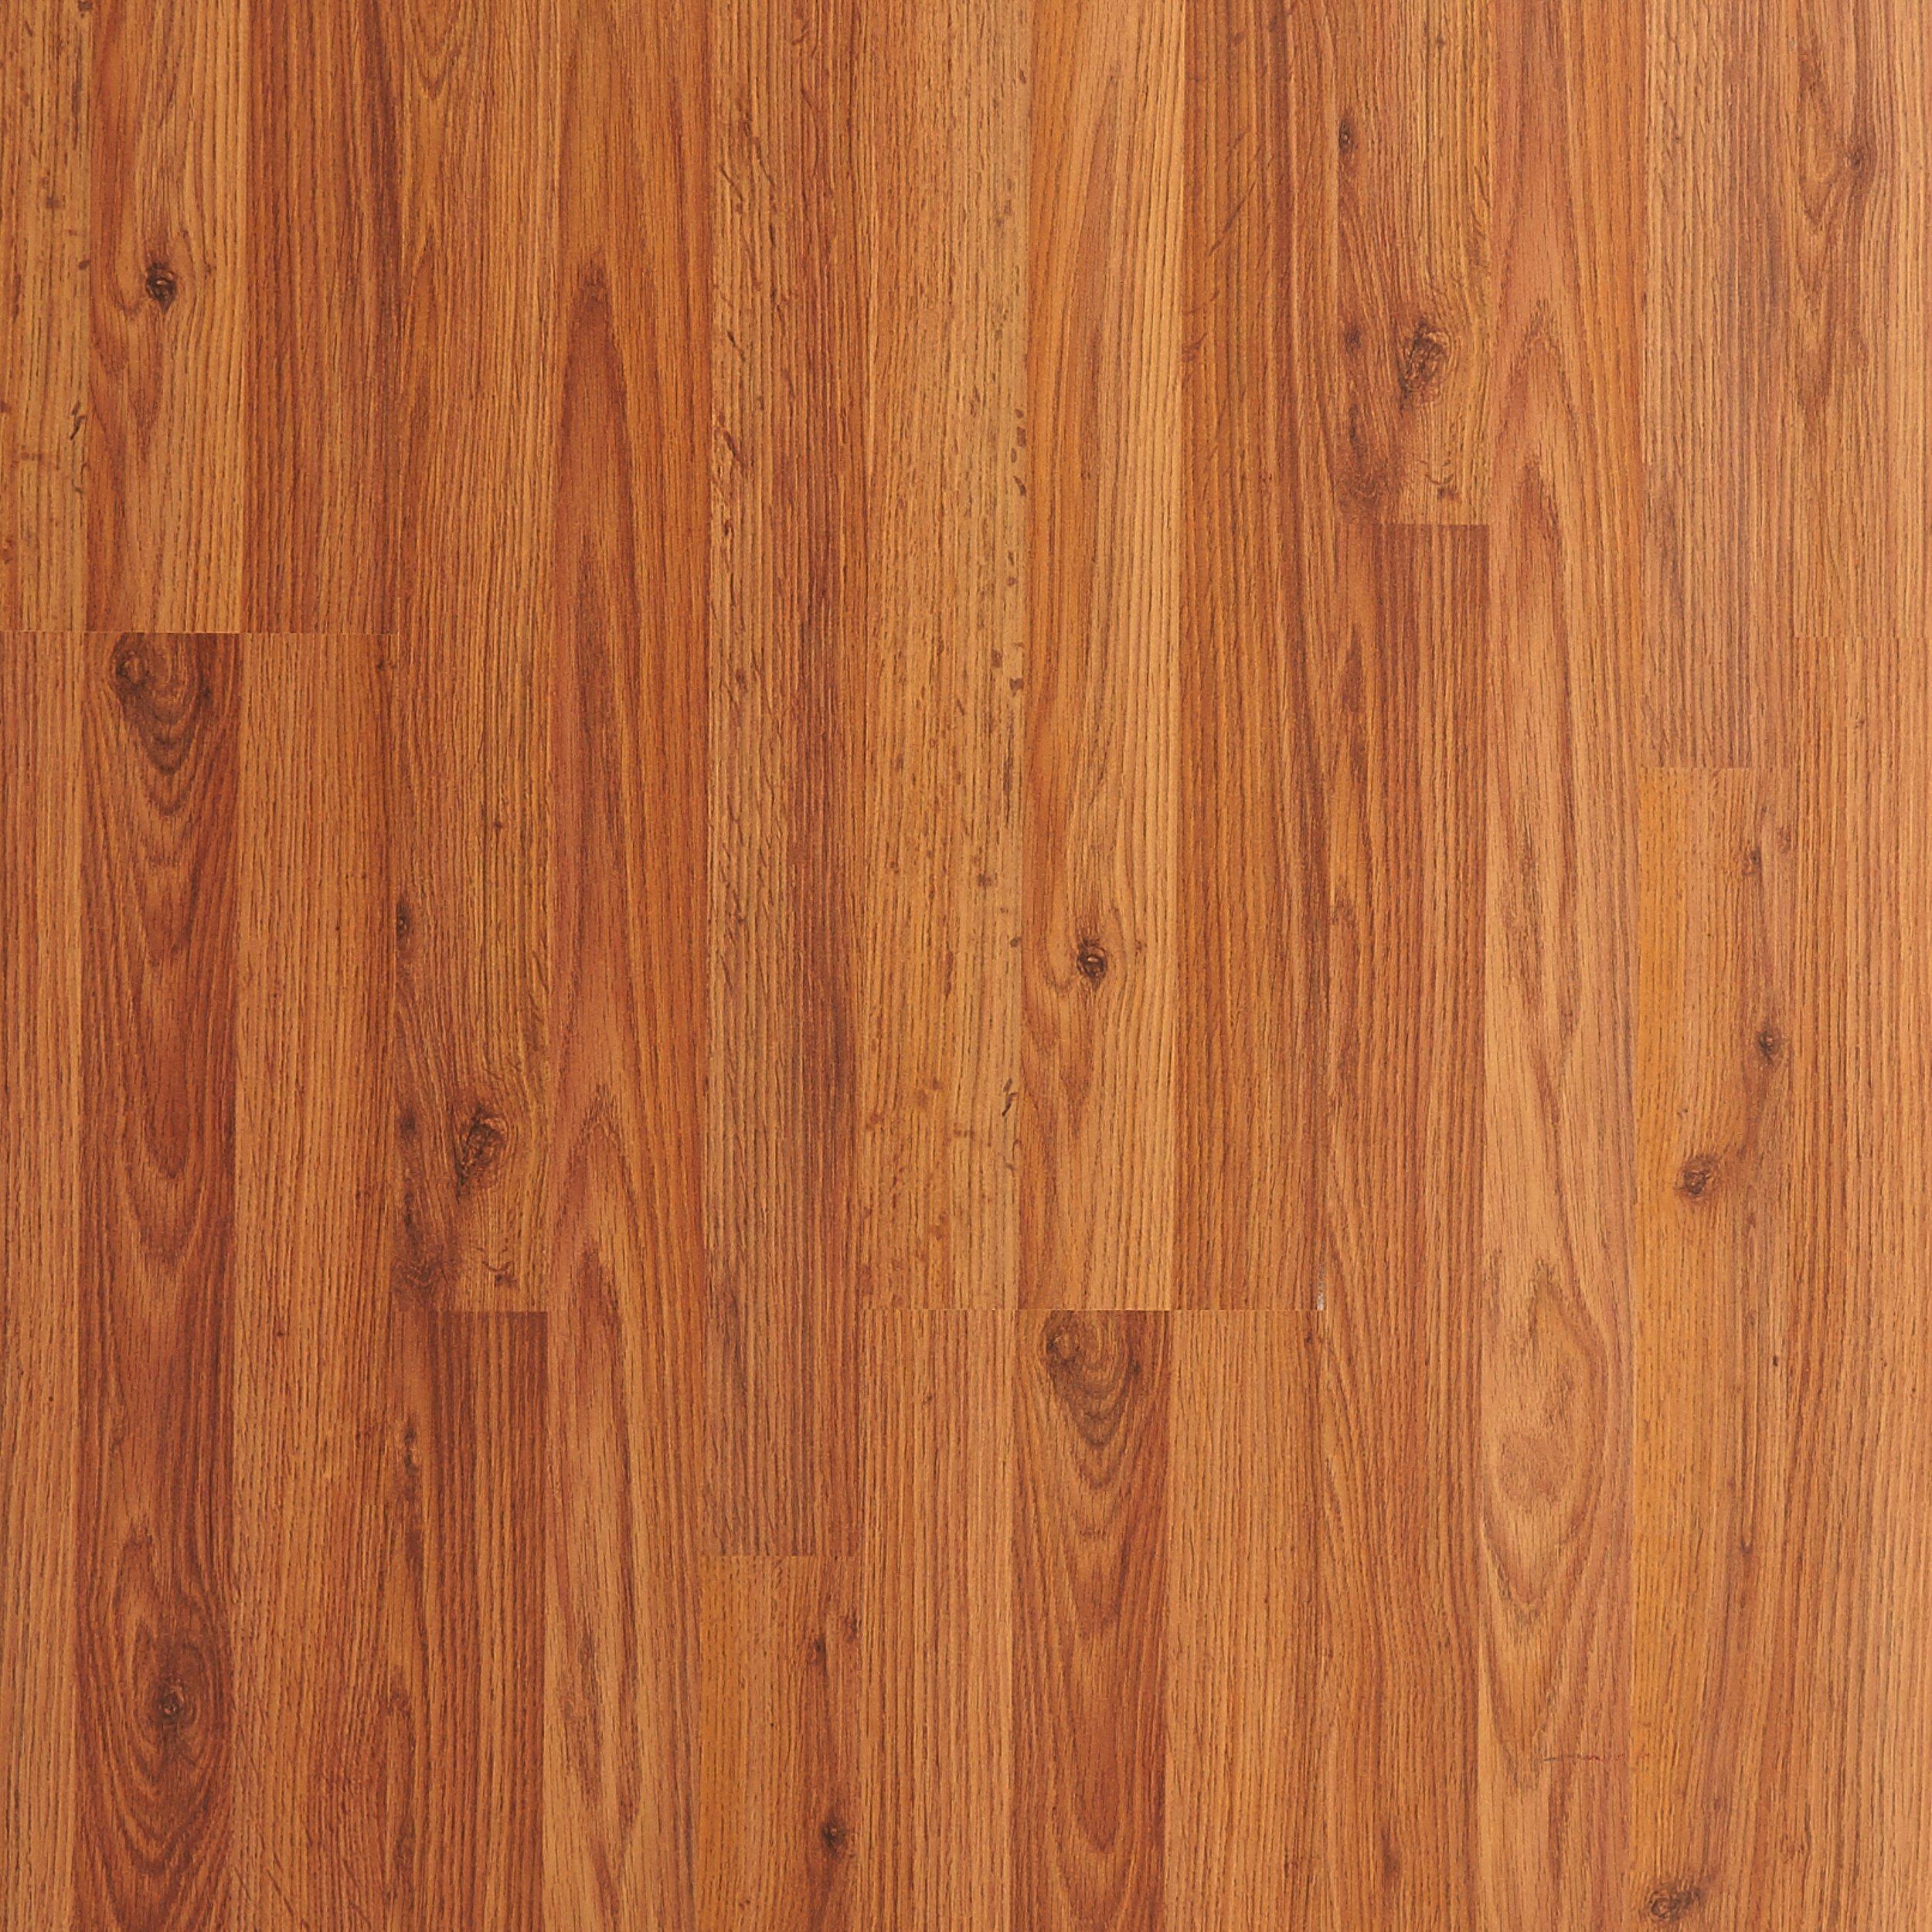 Prestige Oak 3 Strip Laminate